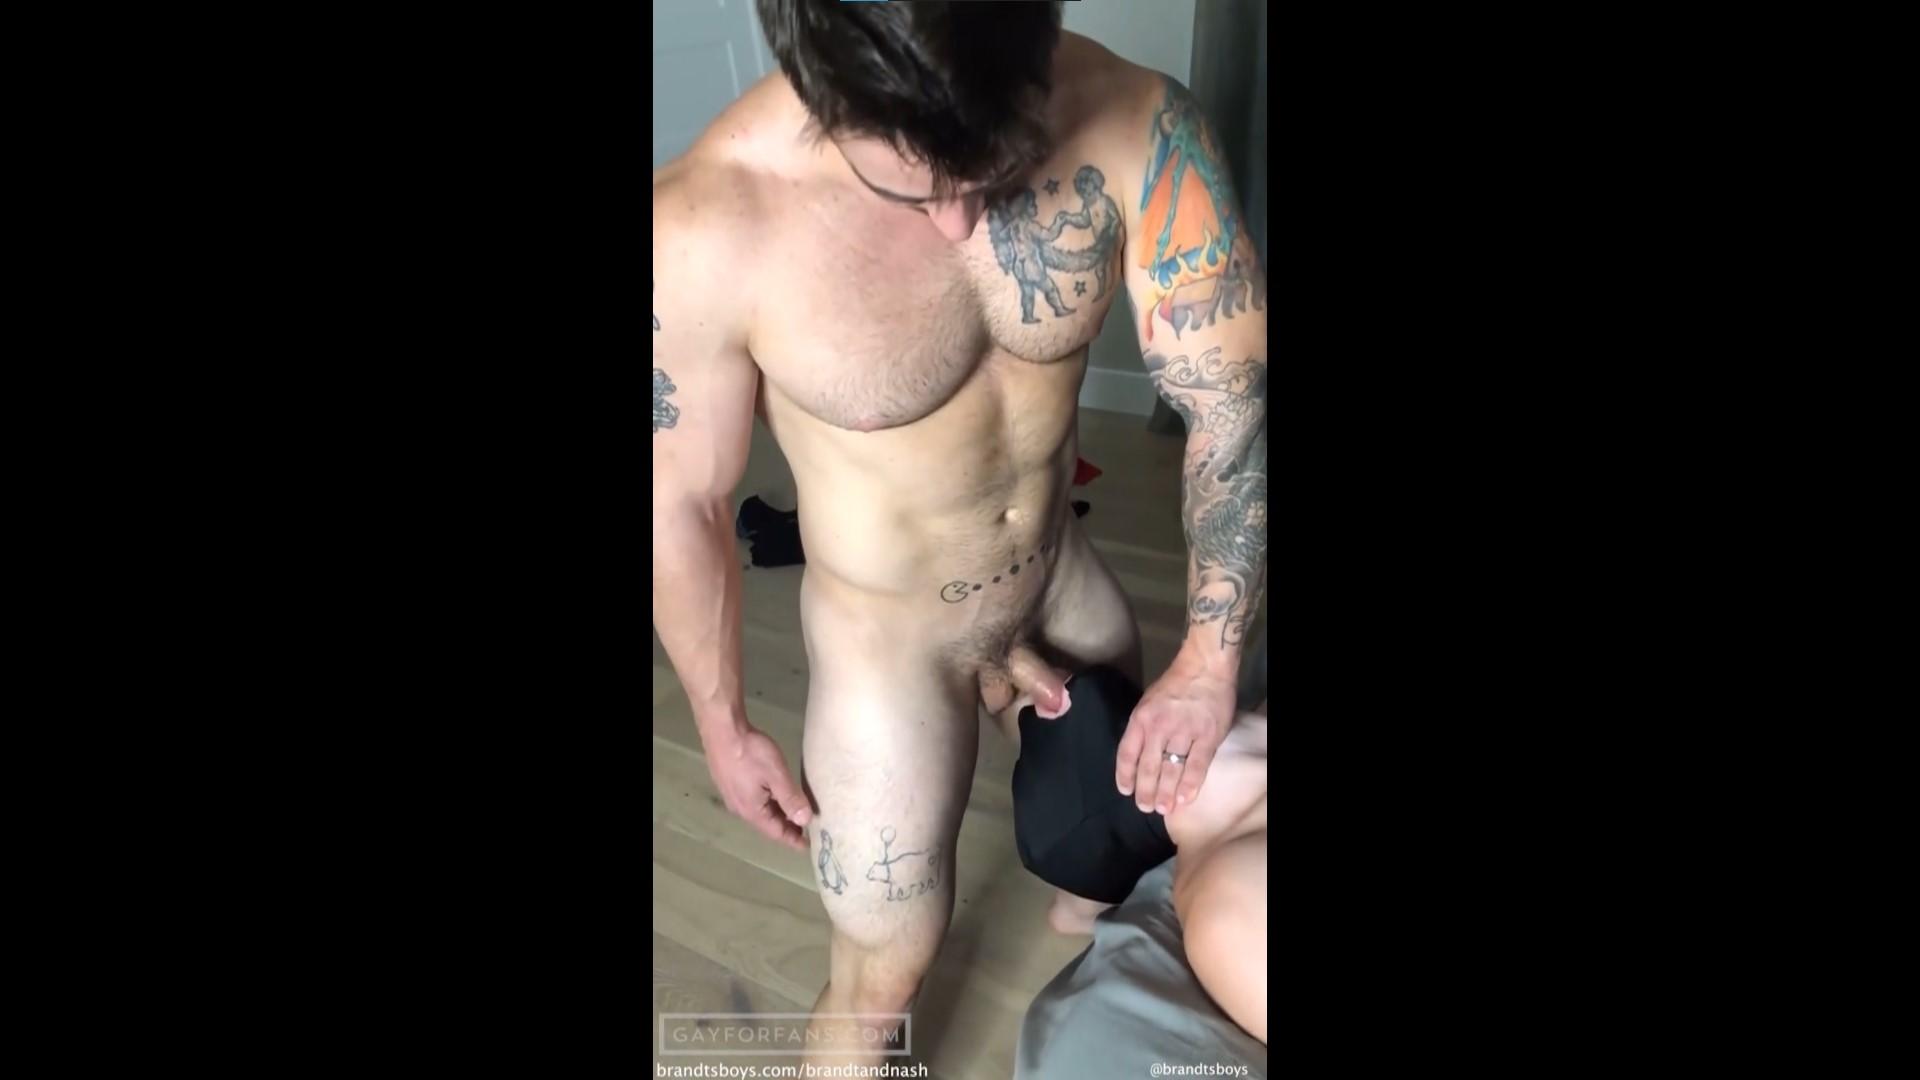 Jordan throat fucks Nash - JordanxBrandt